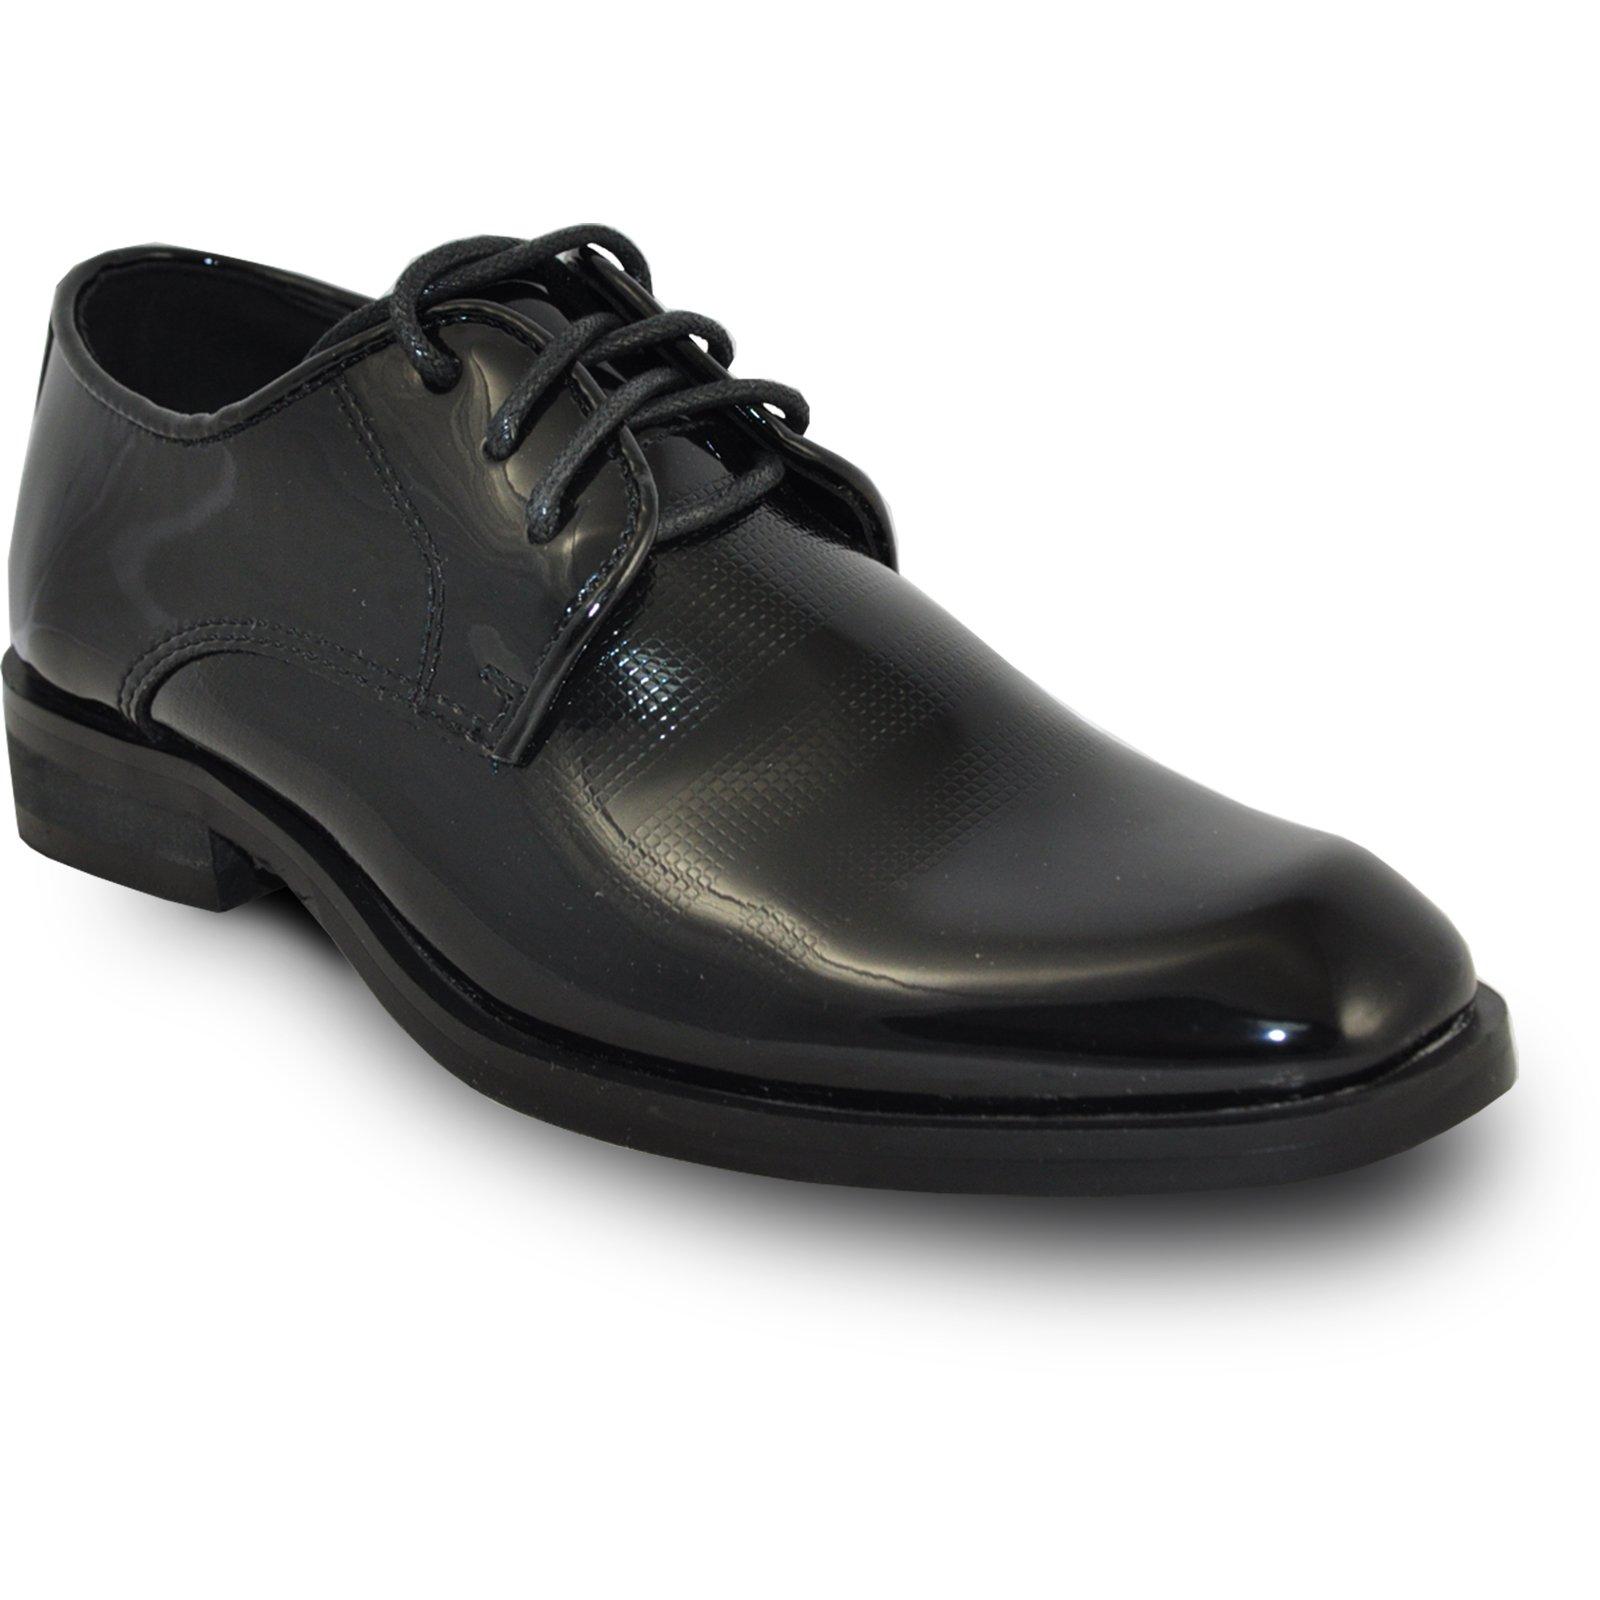 VANGELO Boy ROCKEFELLERKID Dress Shoe Formal Tuxedo for Prom & Wedding Black Patent_3Y